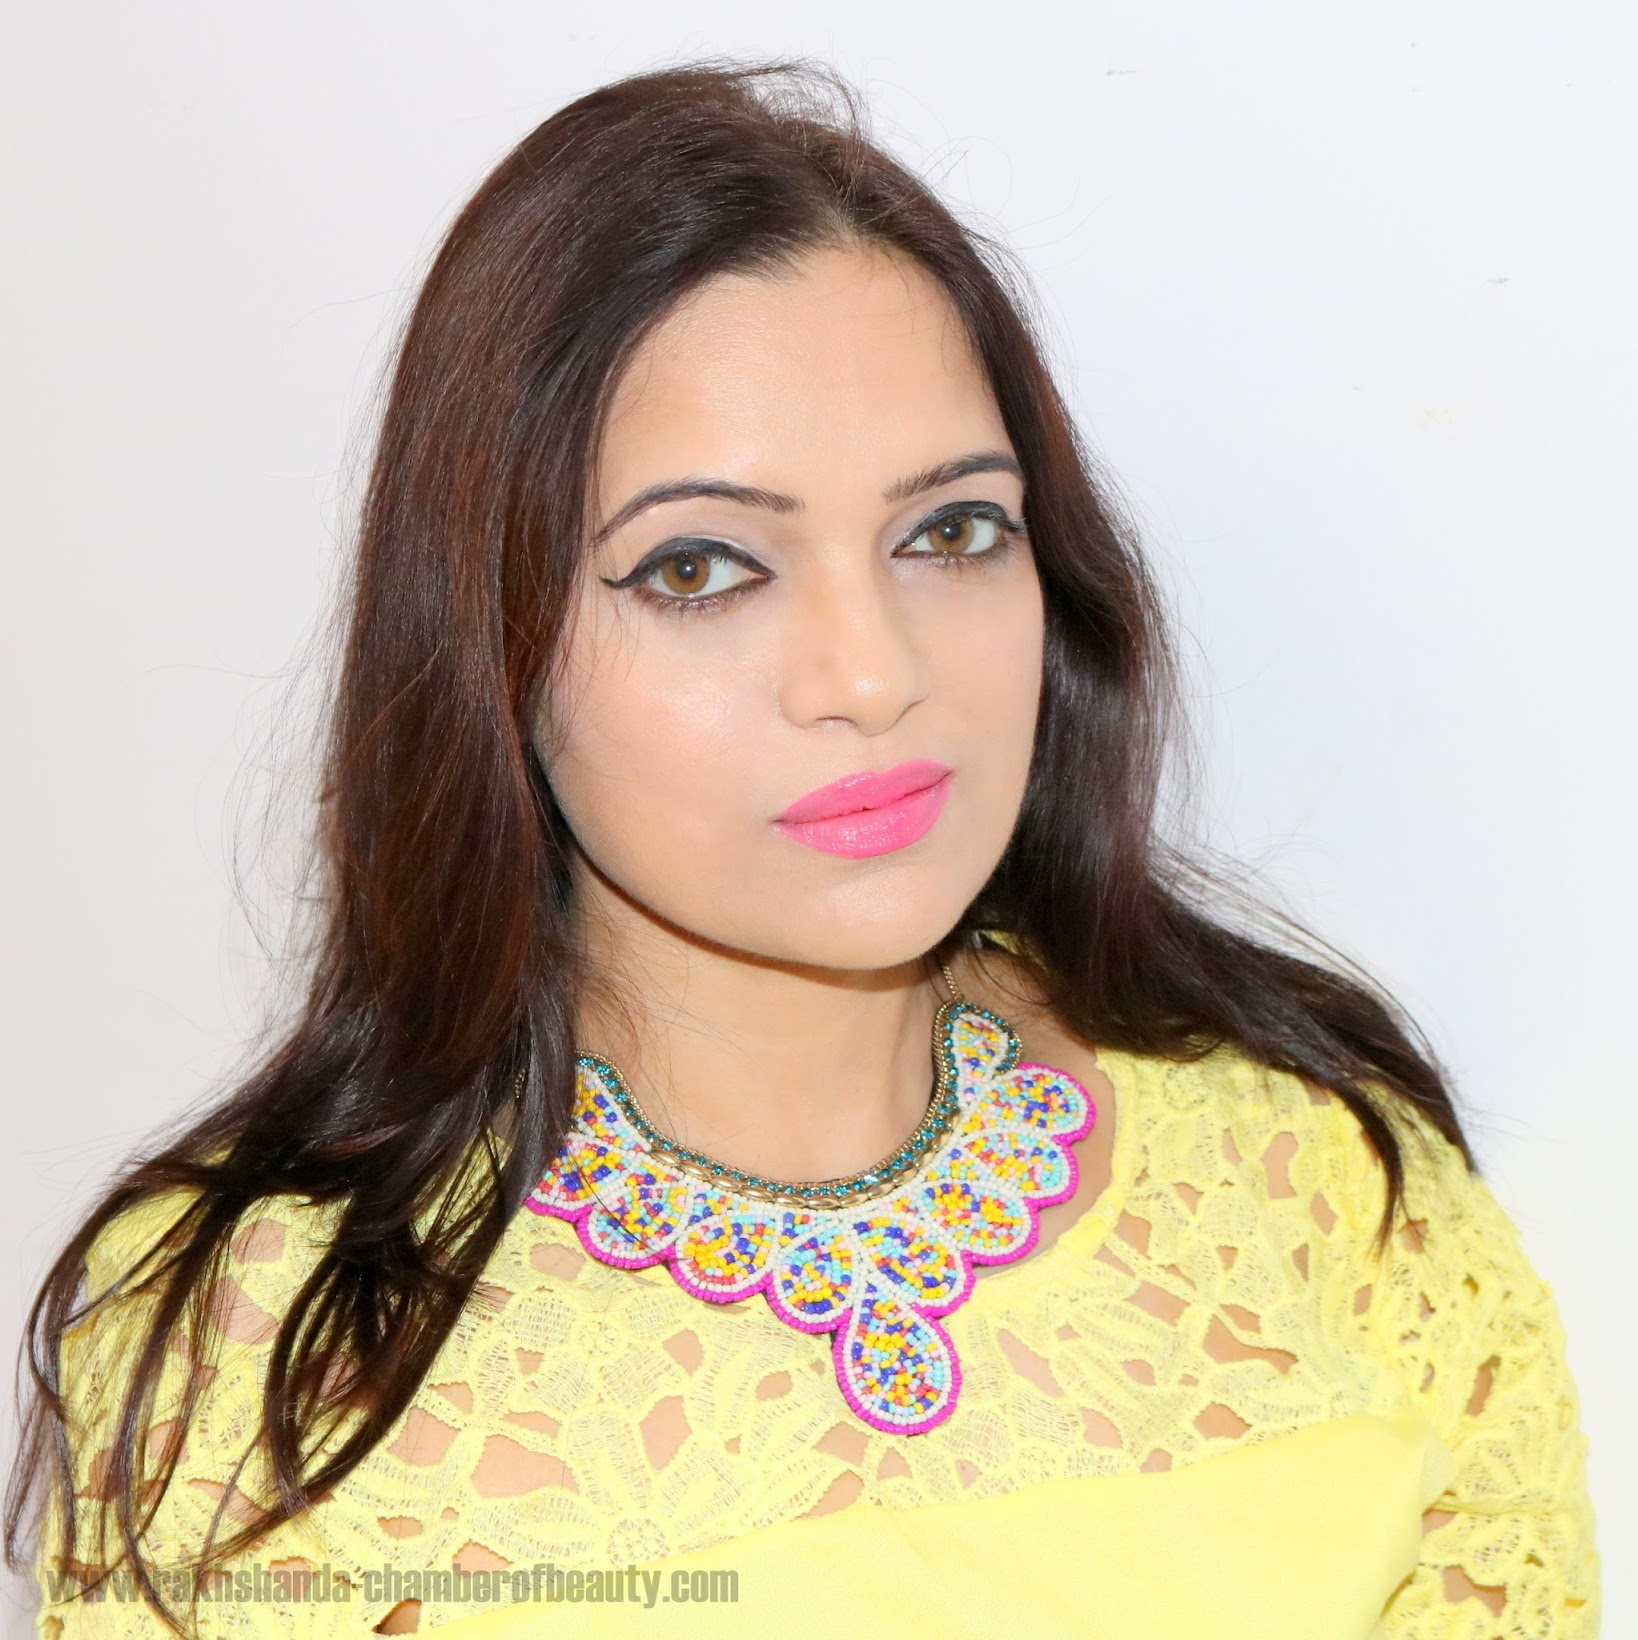 Designer Jewelry from Voylla, fashion jewelry, fashion jewelry online, Indian fashion blogger, Voylla jewelry, Voylla jewelry review